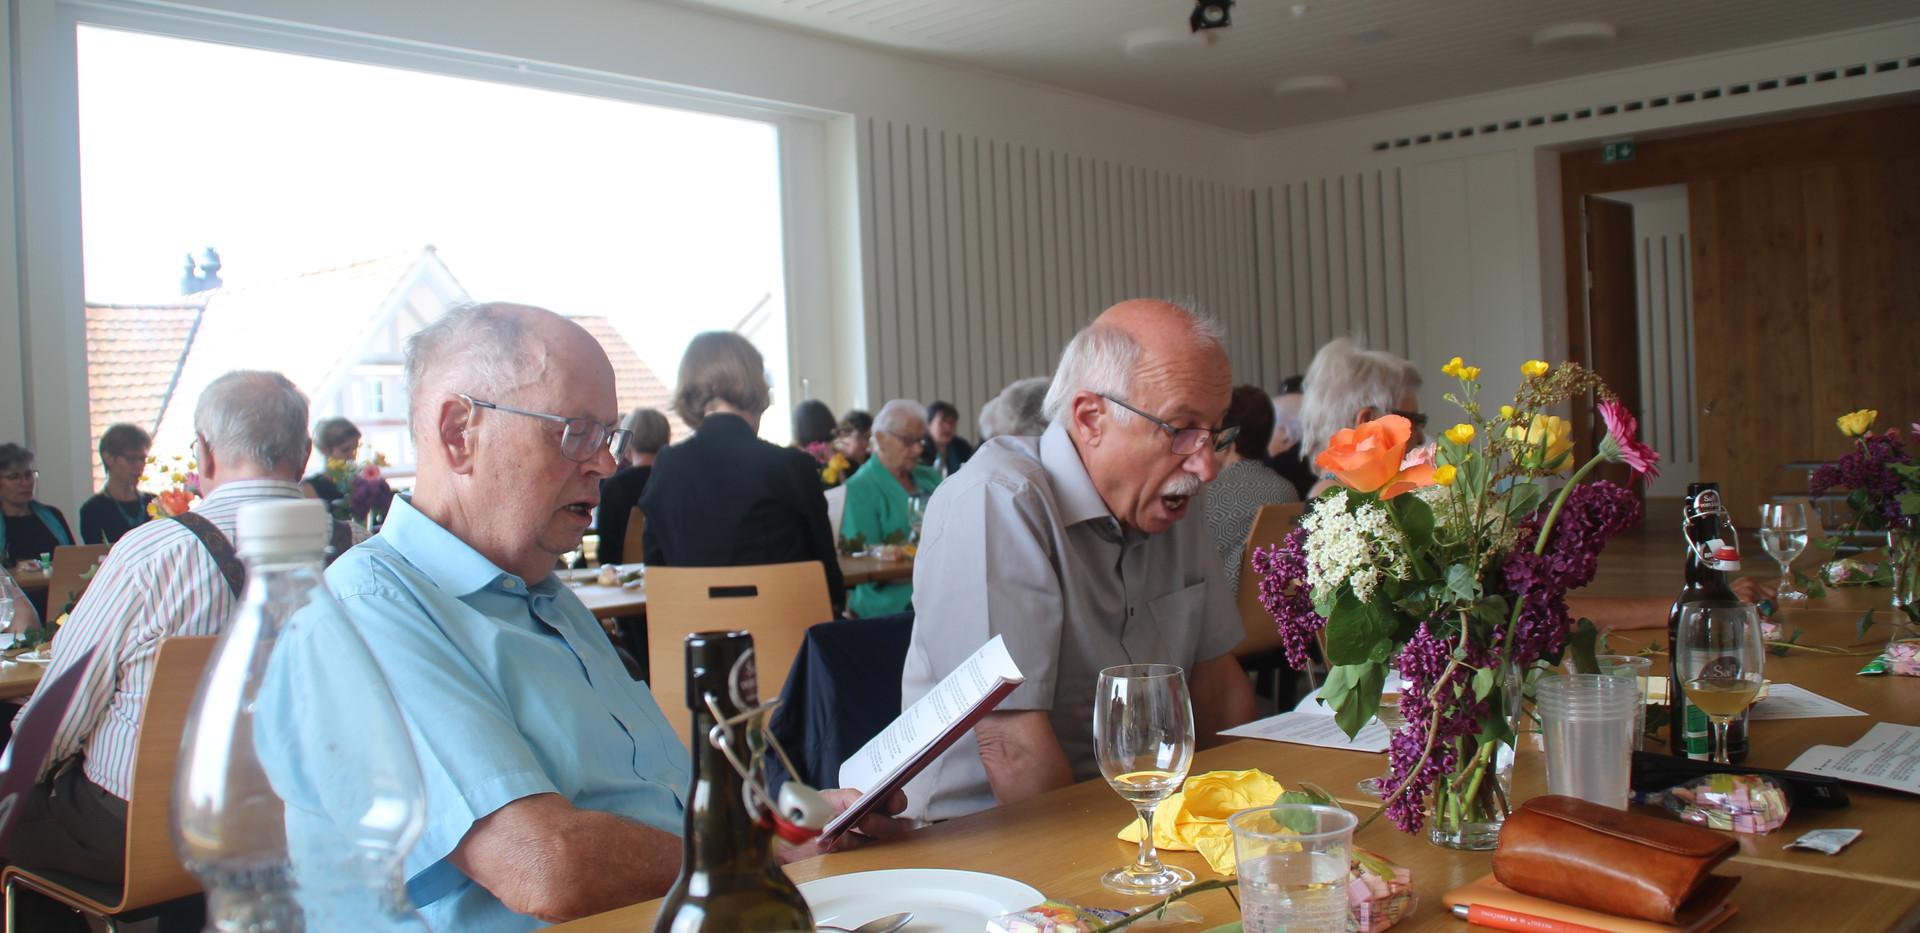 20180506_7. Veteranentreffen in Herisau